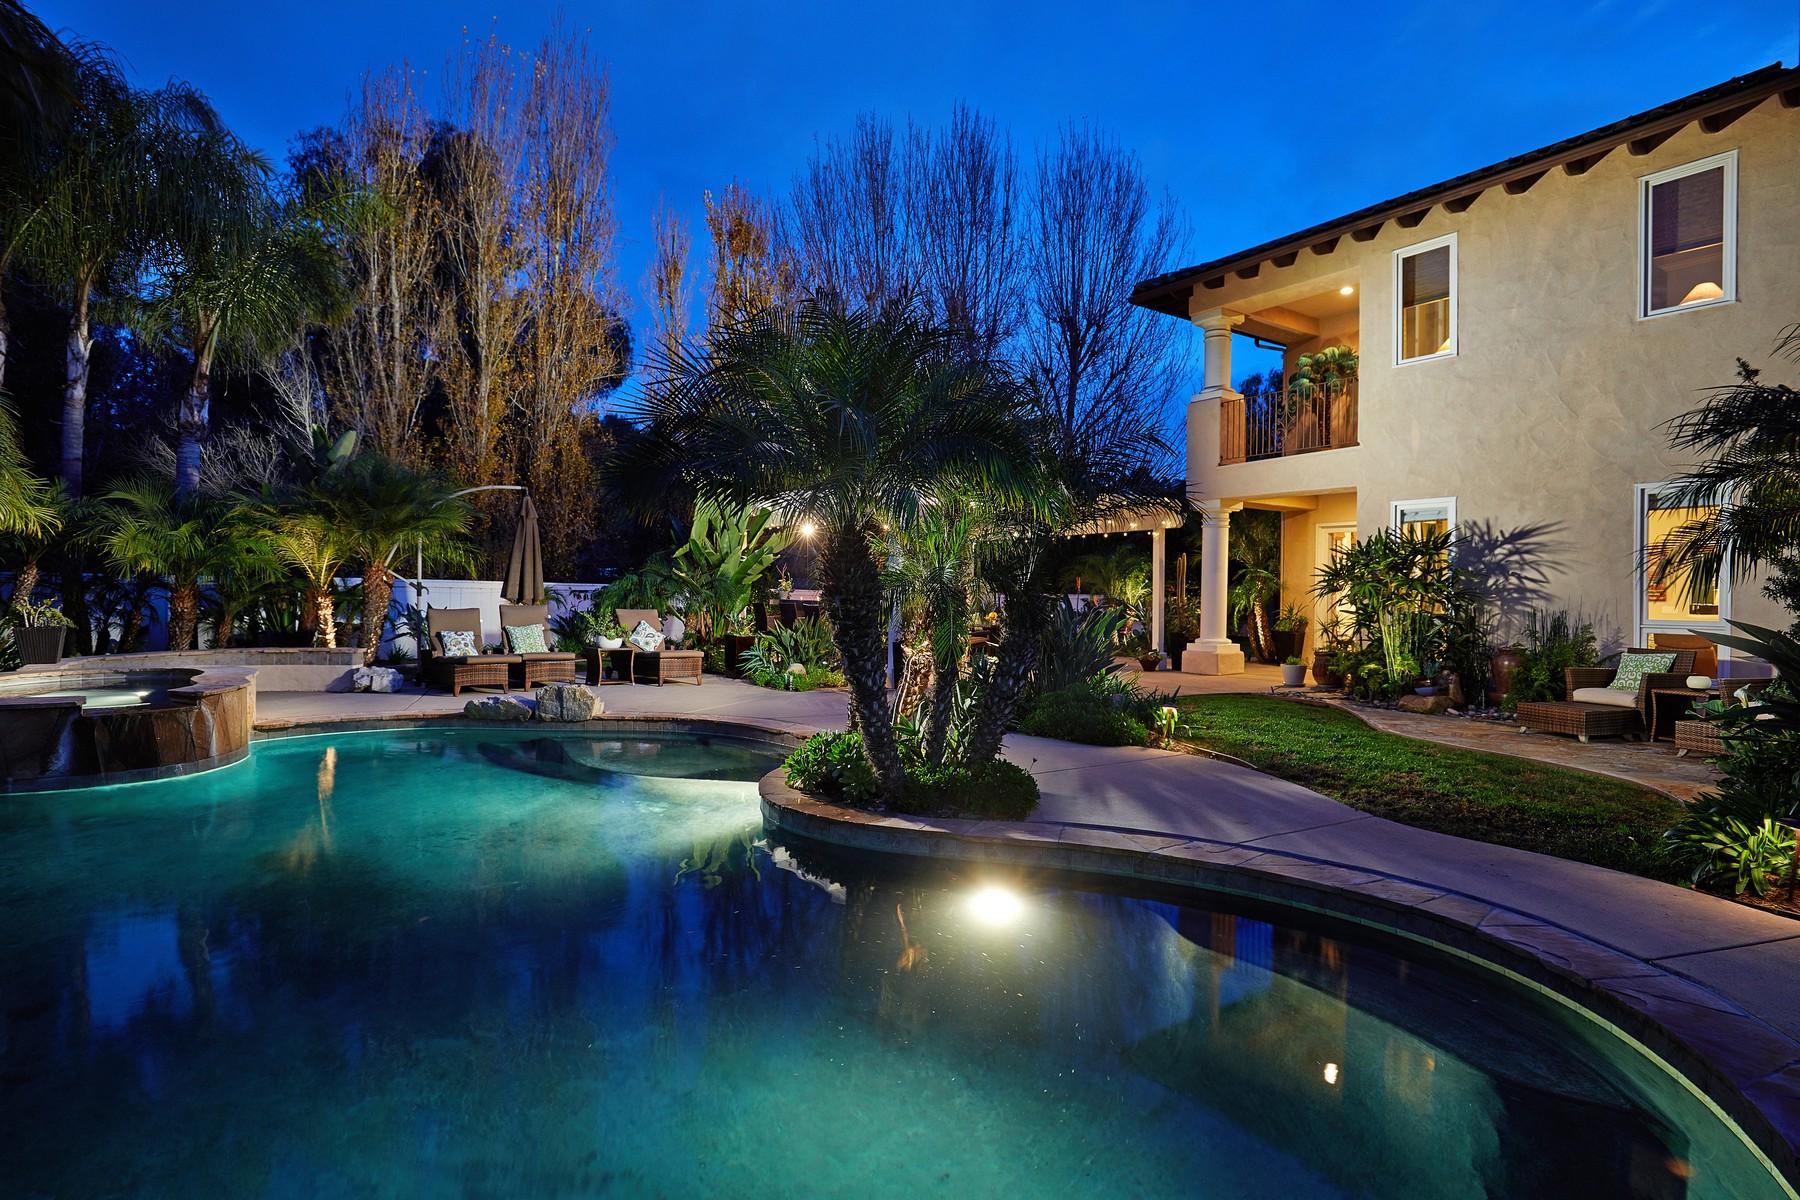 Villa per Vendita alle ore 1032 Valleyside Lane Encinitas, California, 92024 Stati Uniti